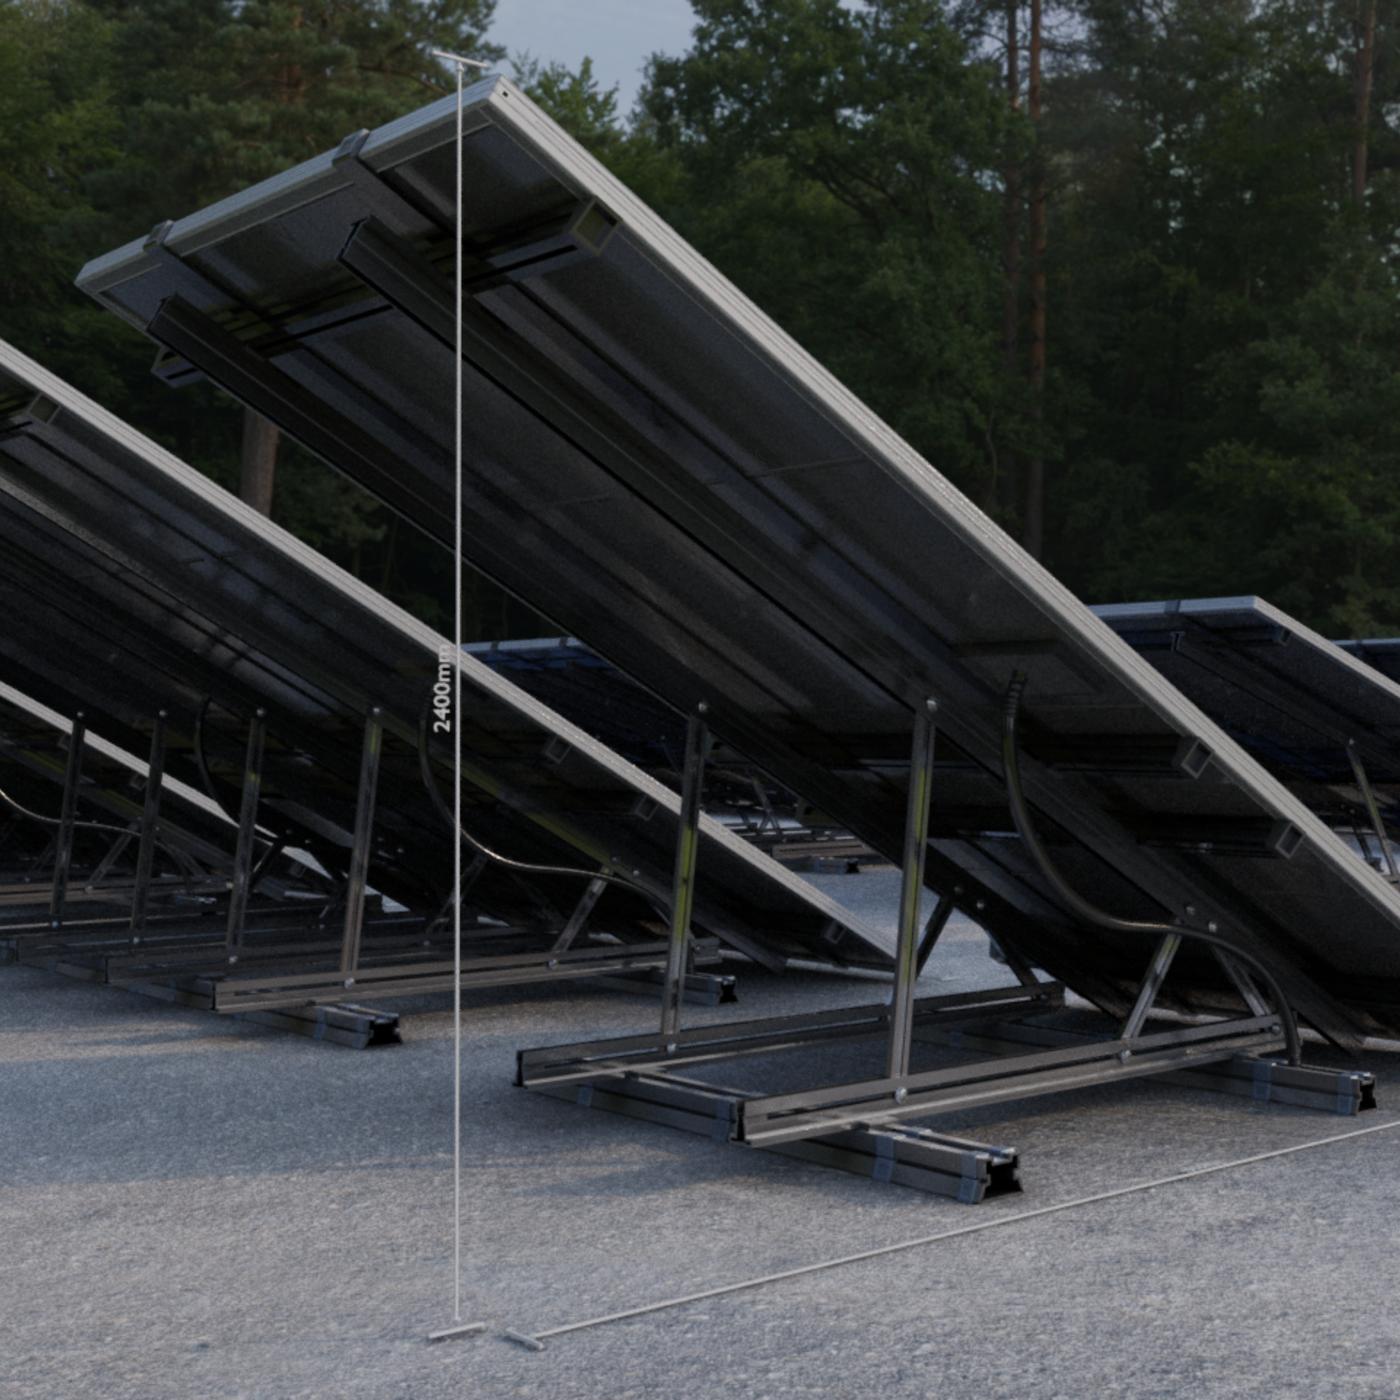 Low-Poly Solar Panels - Blender-2.93